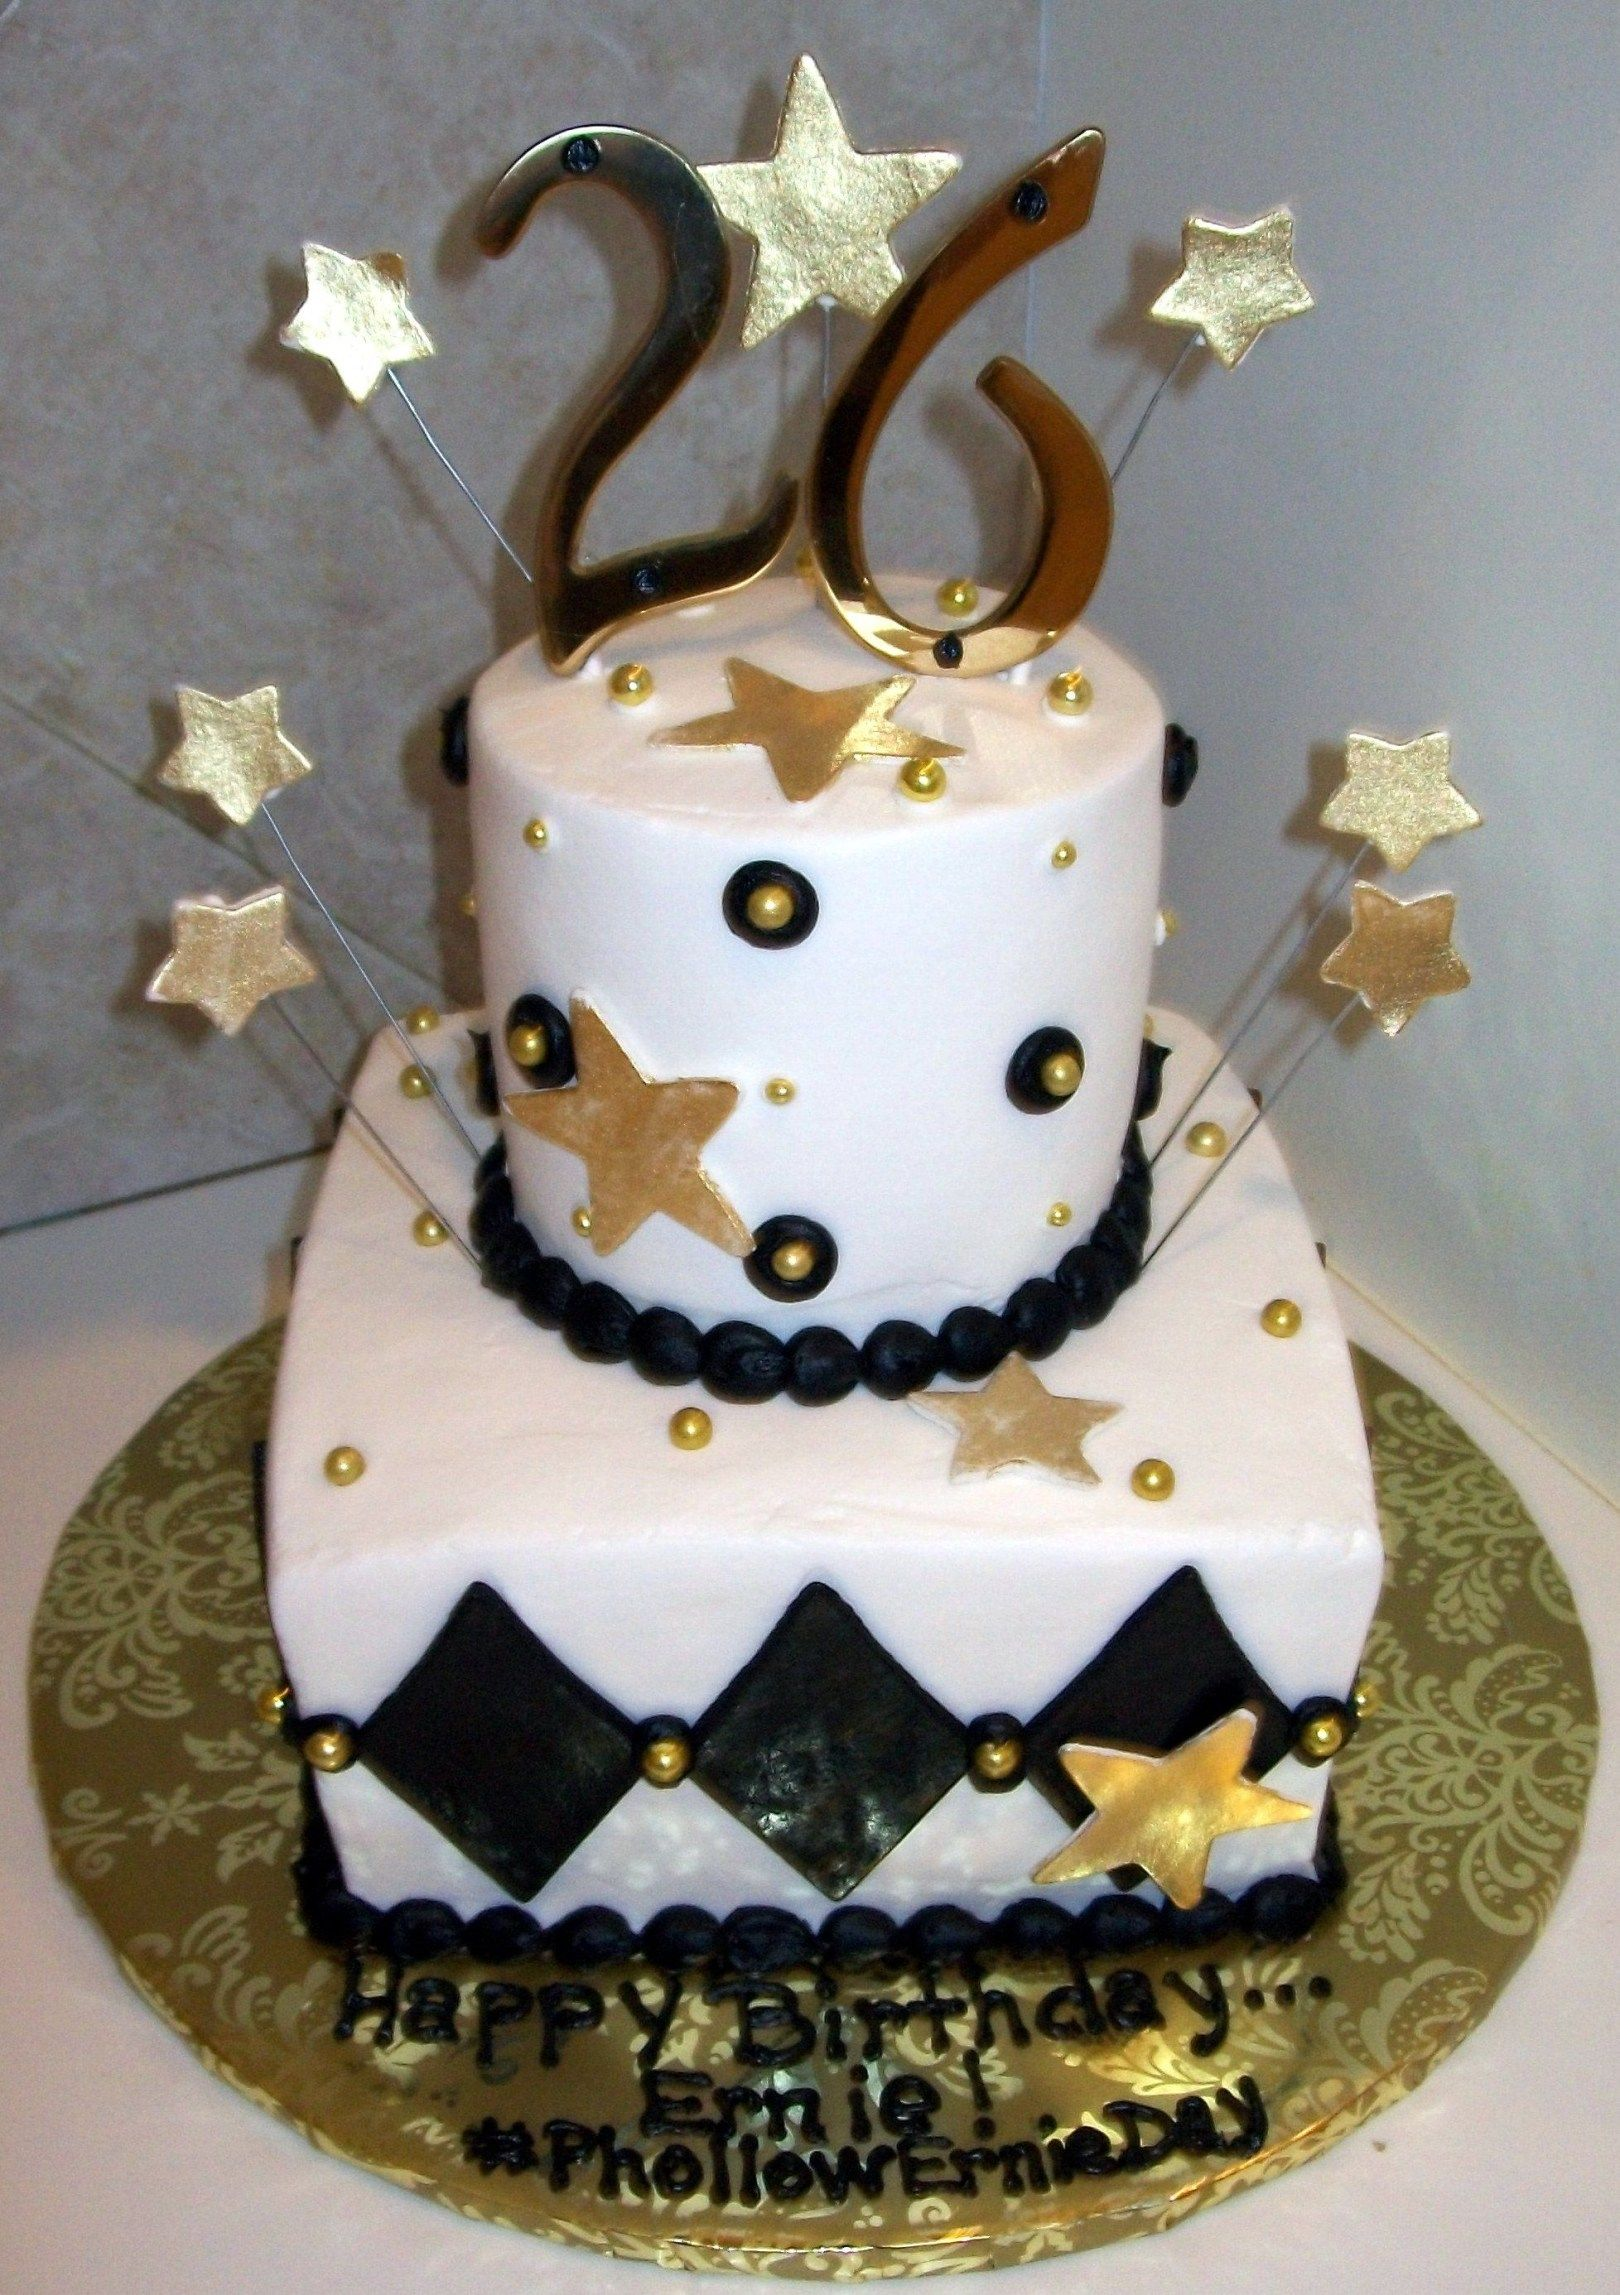 Awesome Birthday Cake Design 26Th Birthday Cake Design Birthday Cake Funny Birthday Cards Online Barepcheapnameinfo